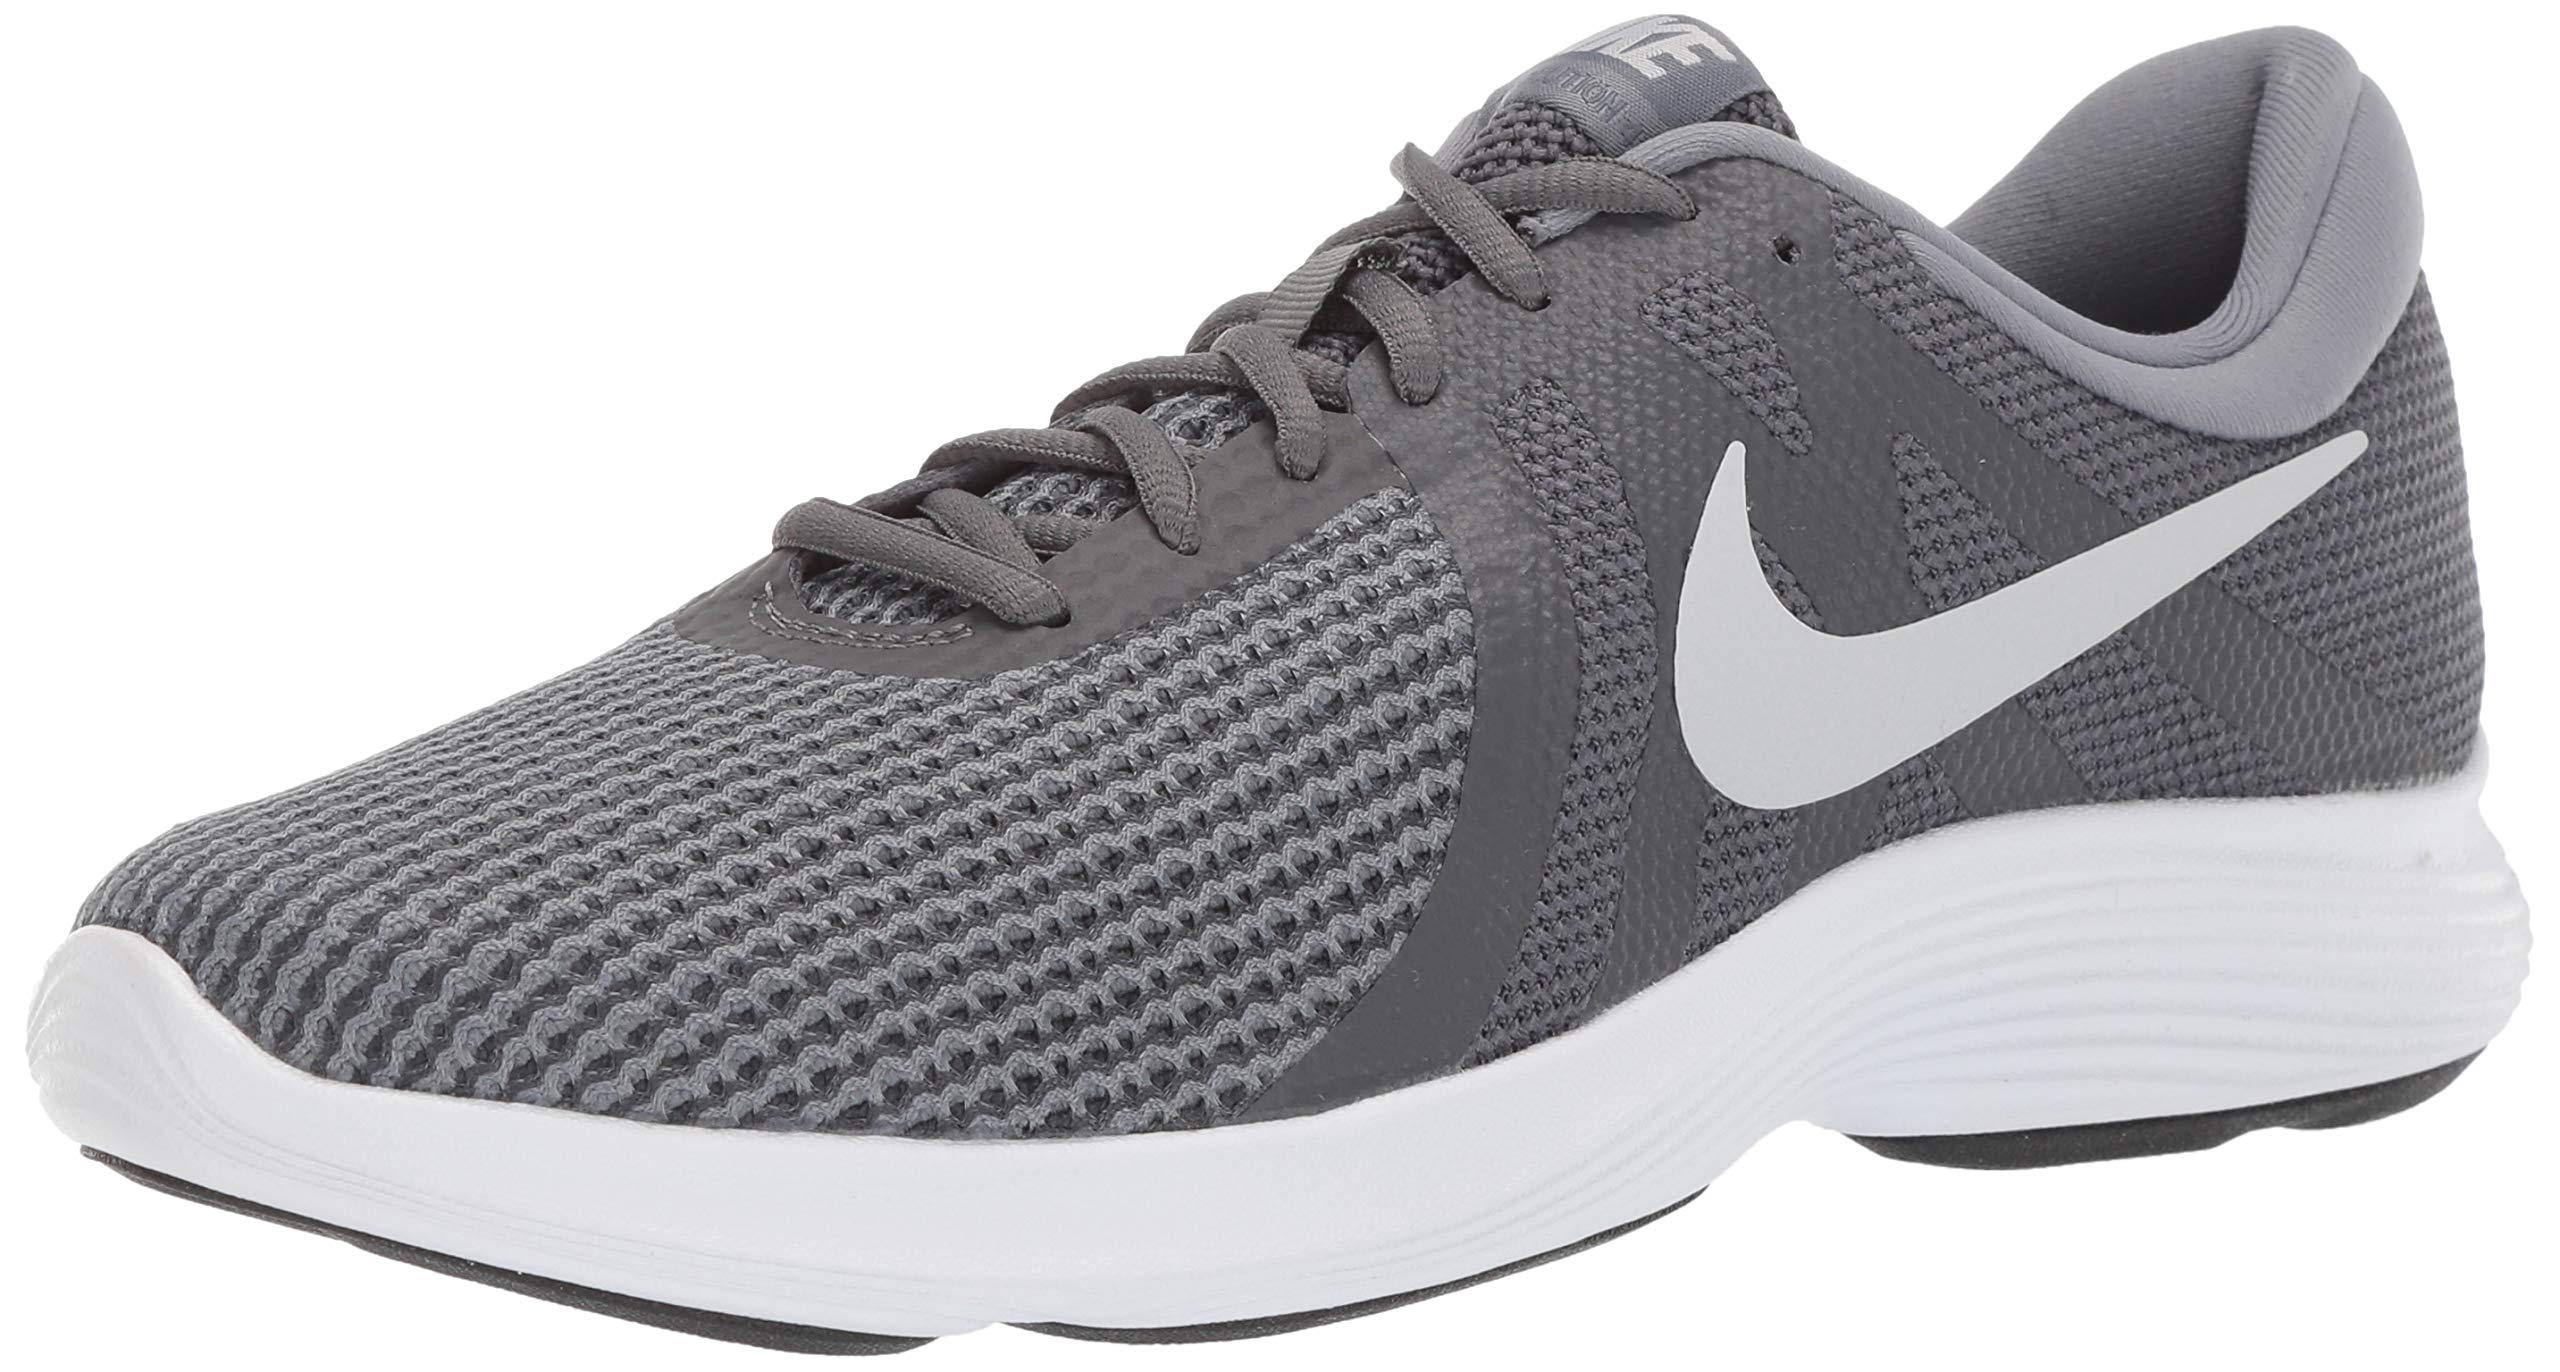 Nike Women's Revolution 4 Running Shoe, Dark Pure Platinum-Cool Grey, 5 Regular US